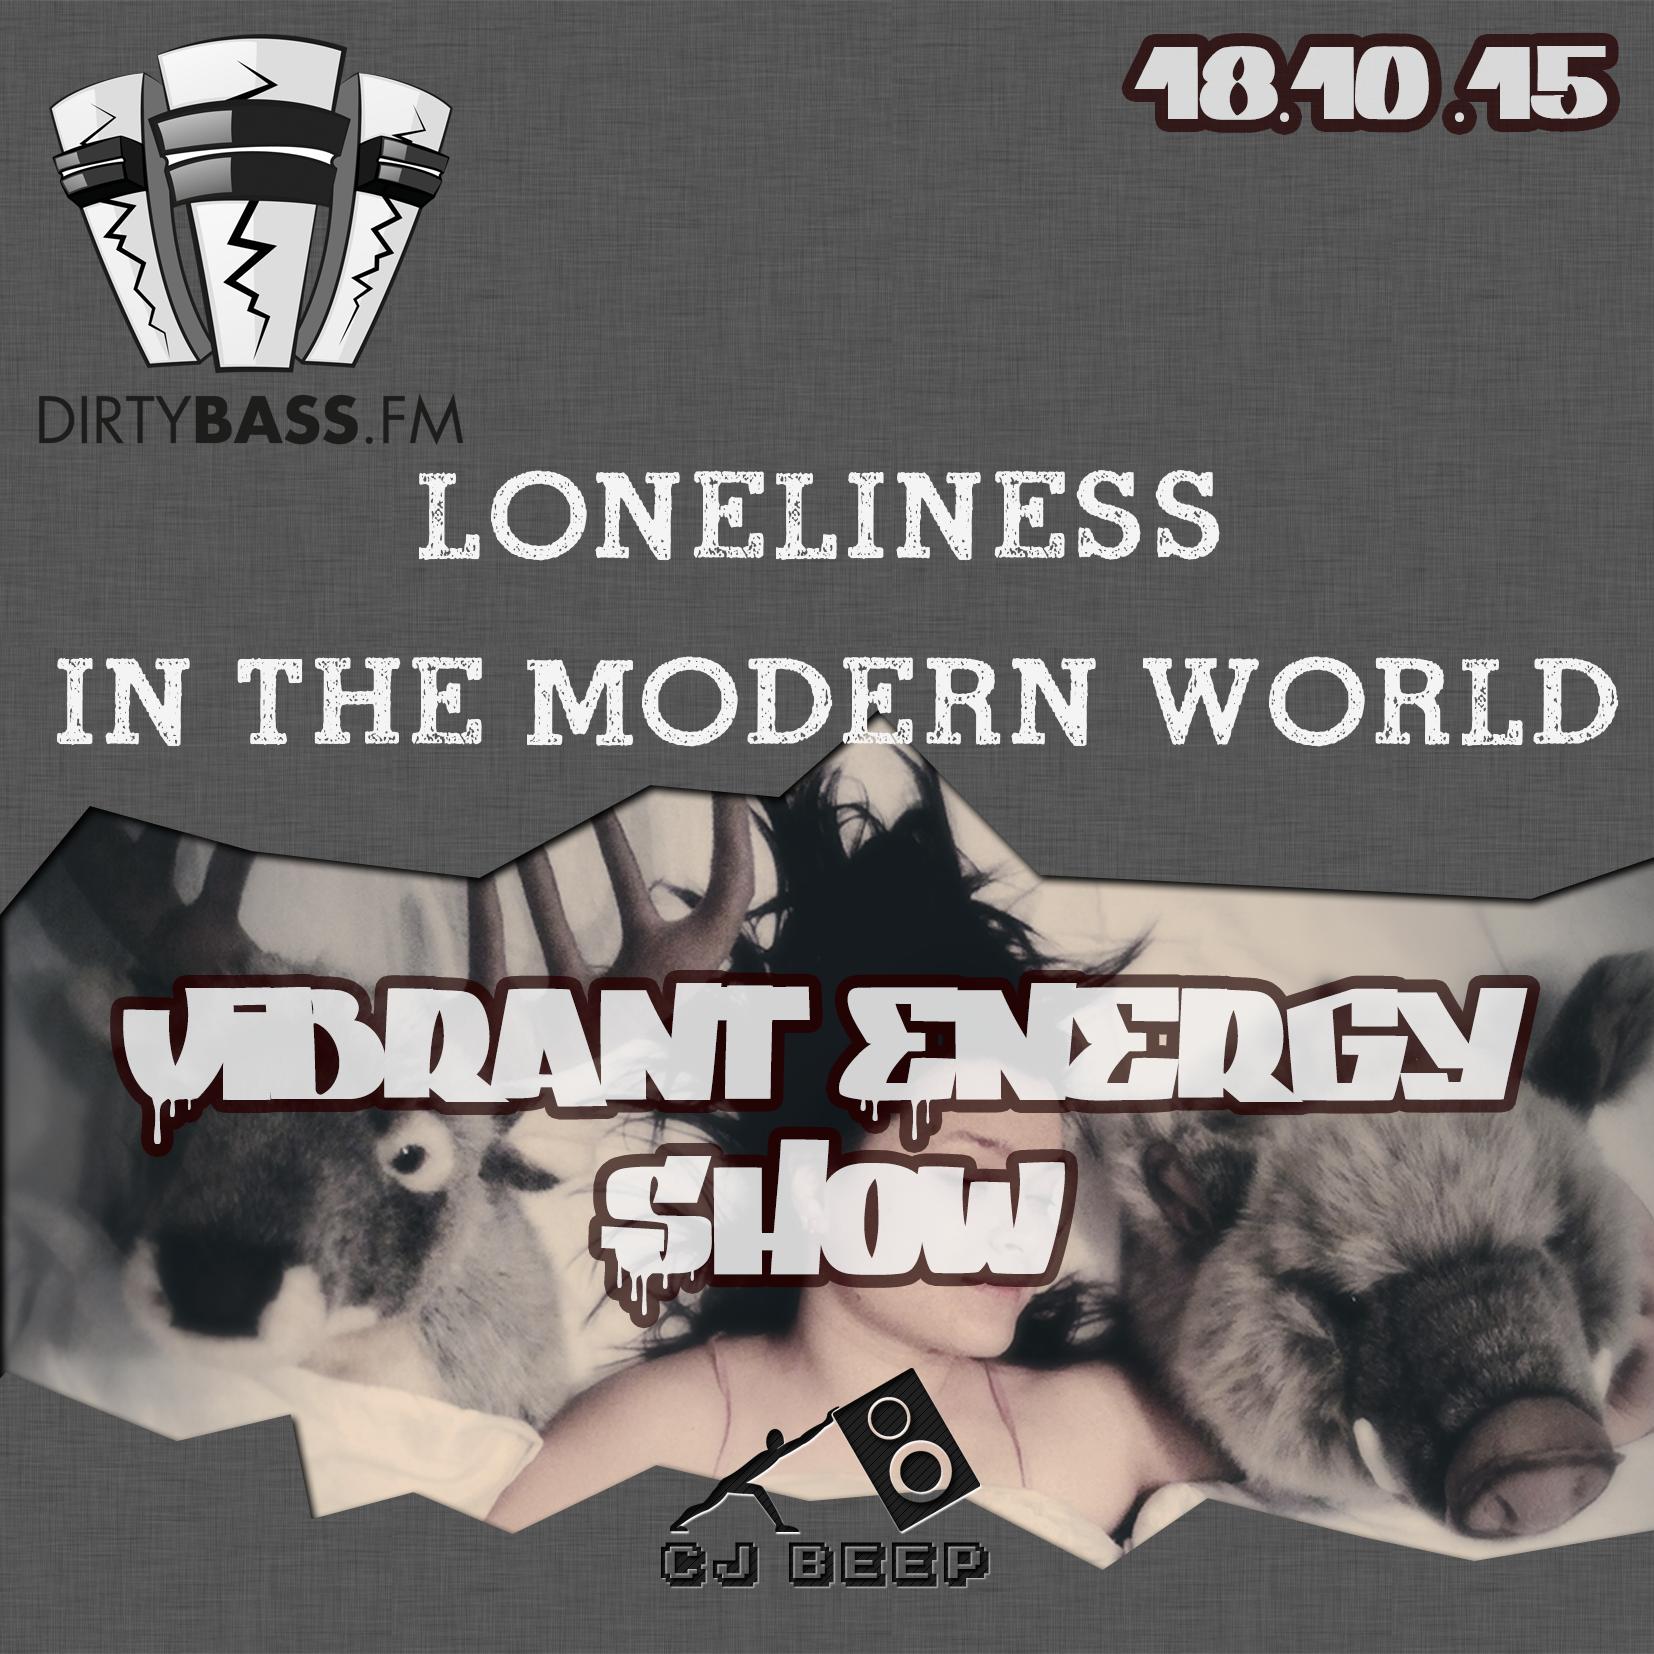 CJ Beep – Loneliness in the Modern World